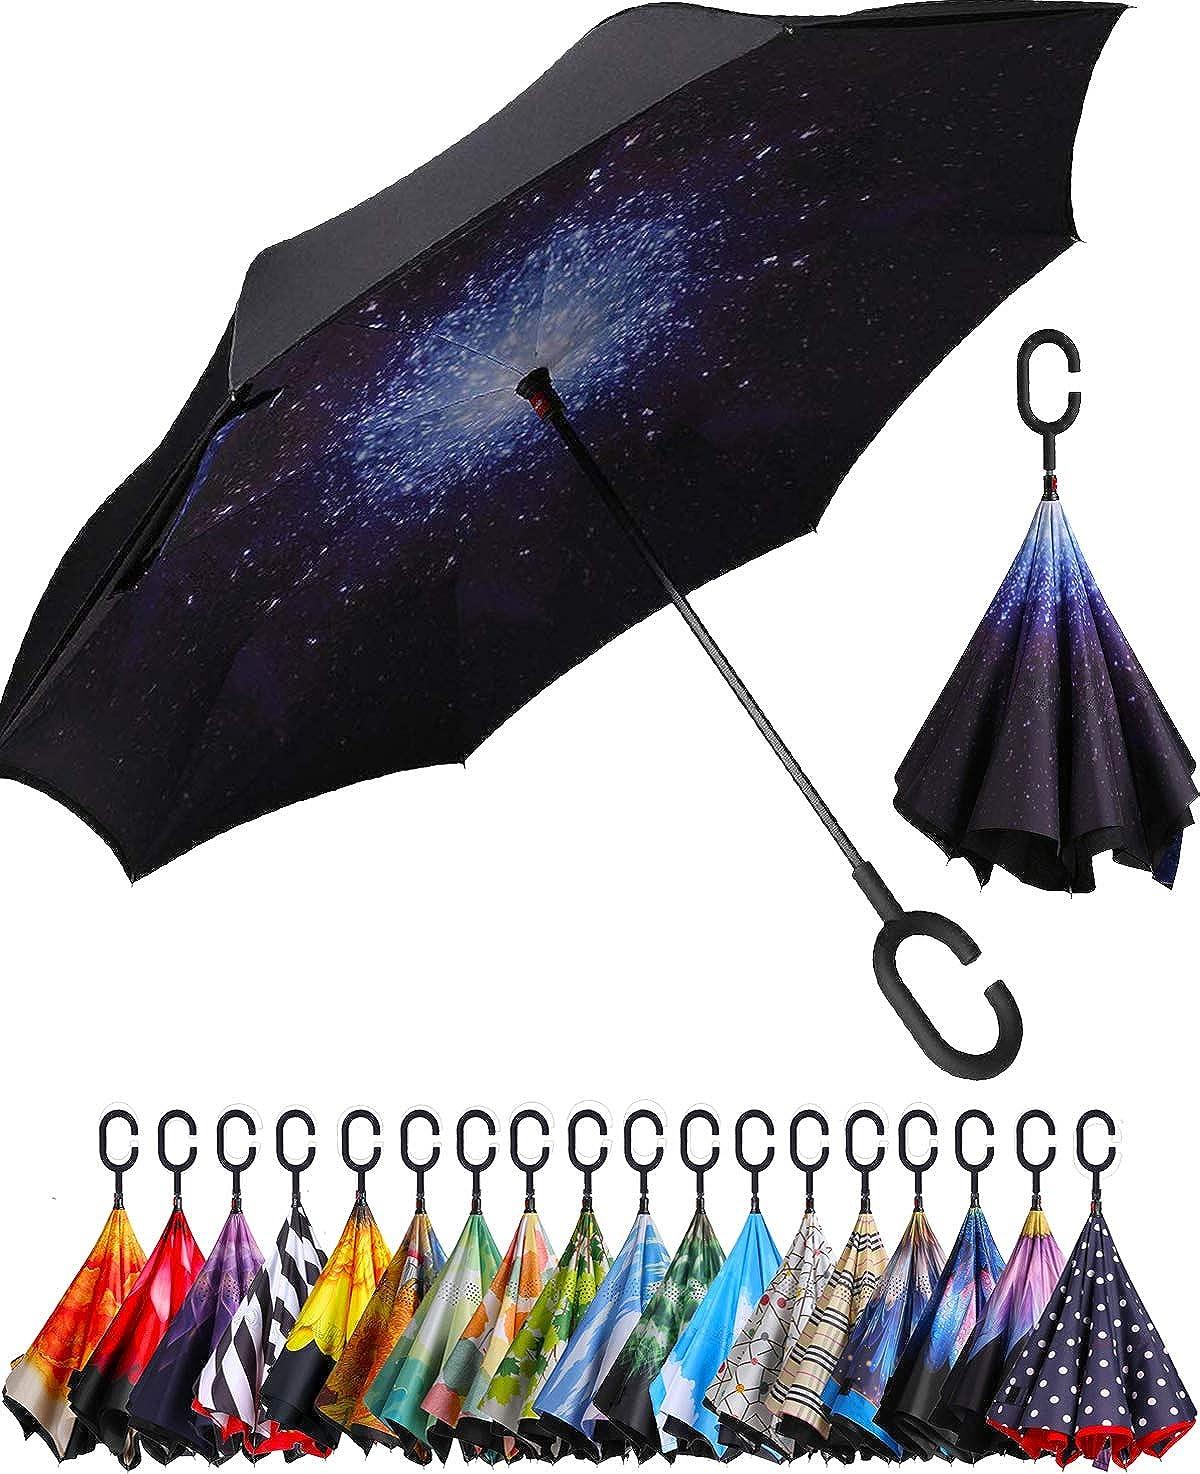 Upside Down Umbrellas C-Shaped Handle Women Men Double Layer Inside Out Folding Umbrella Rainbow Shading Reverse Inverted Windproof Umbrella